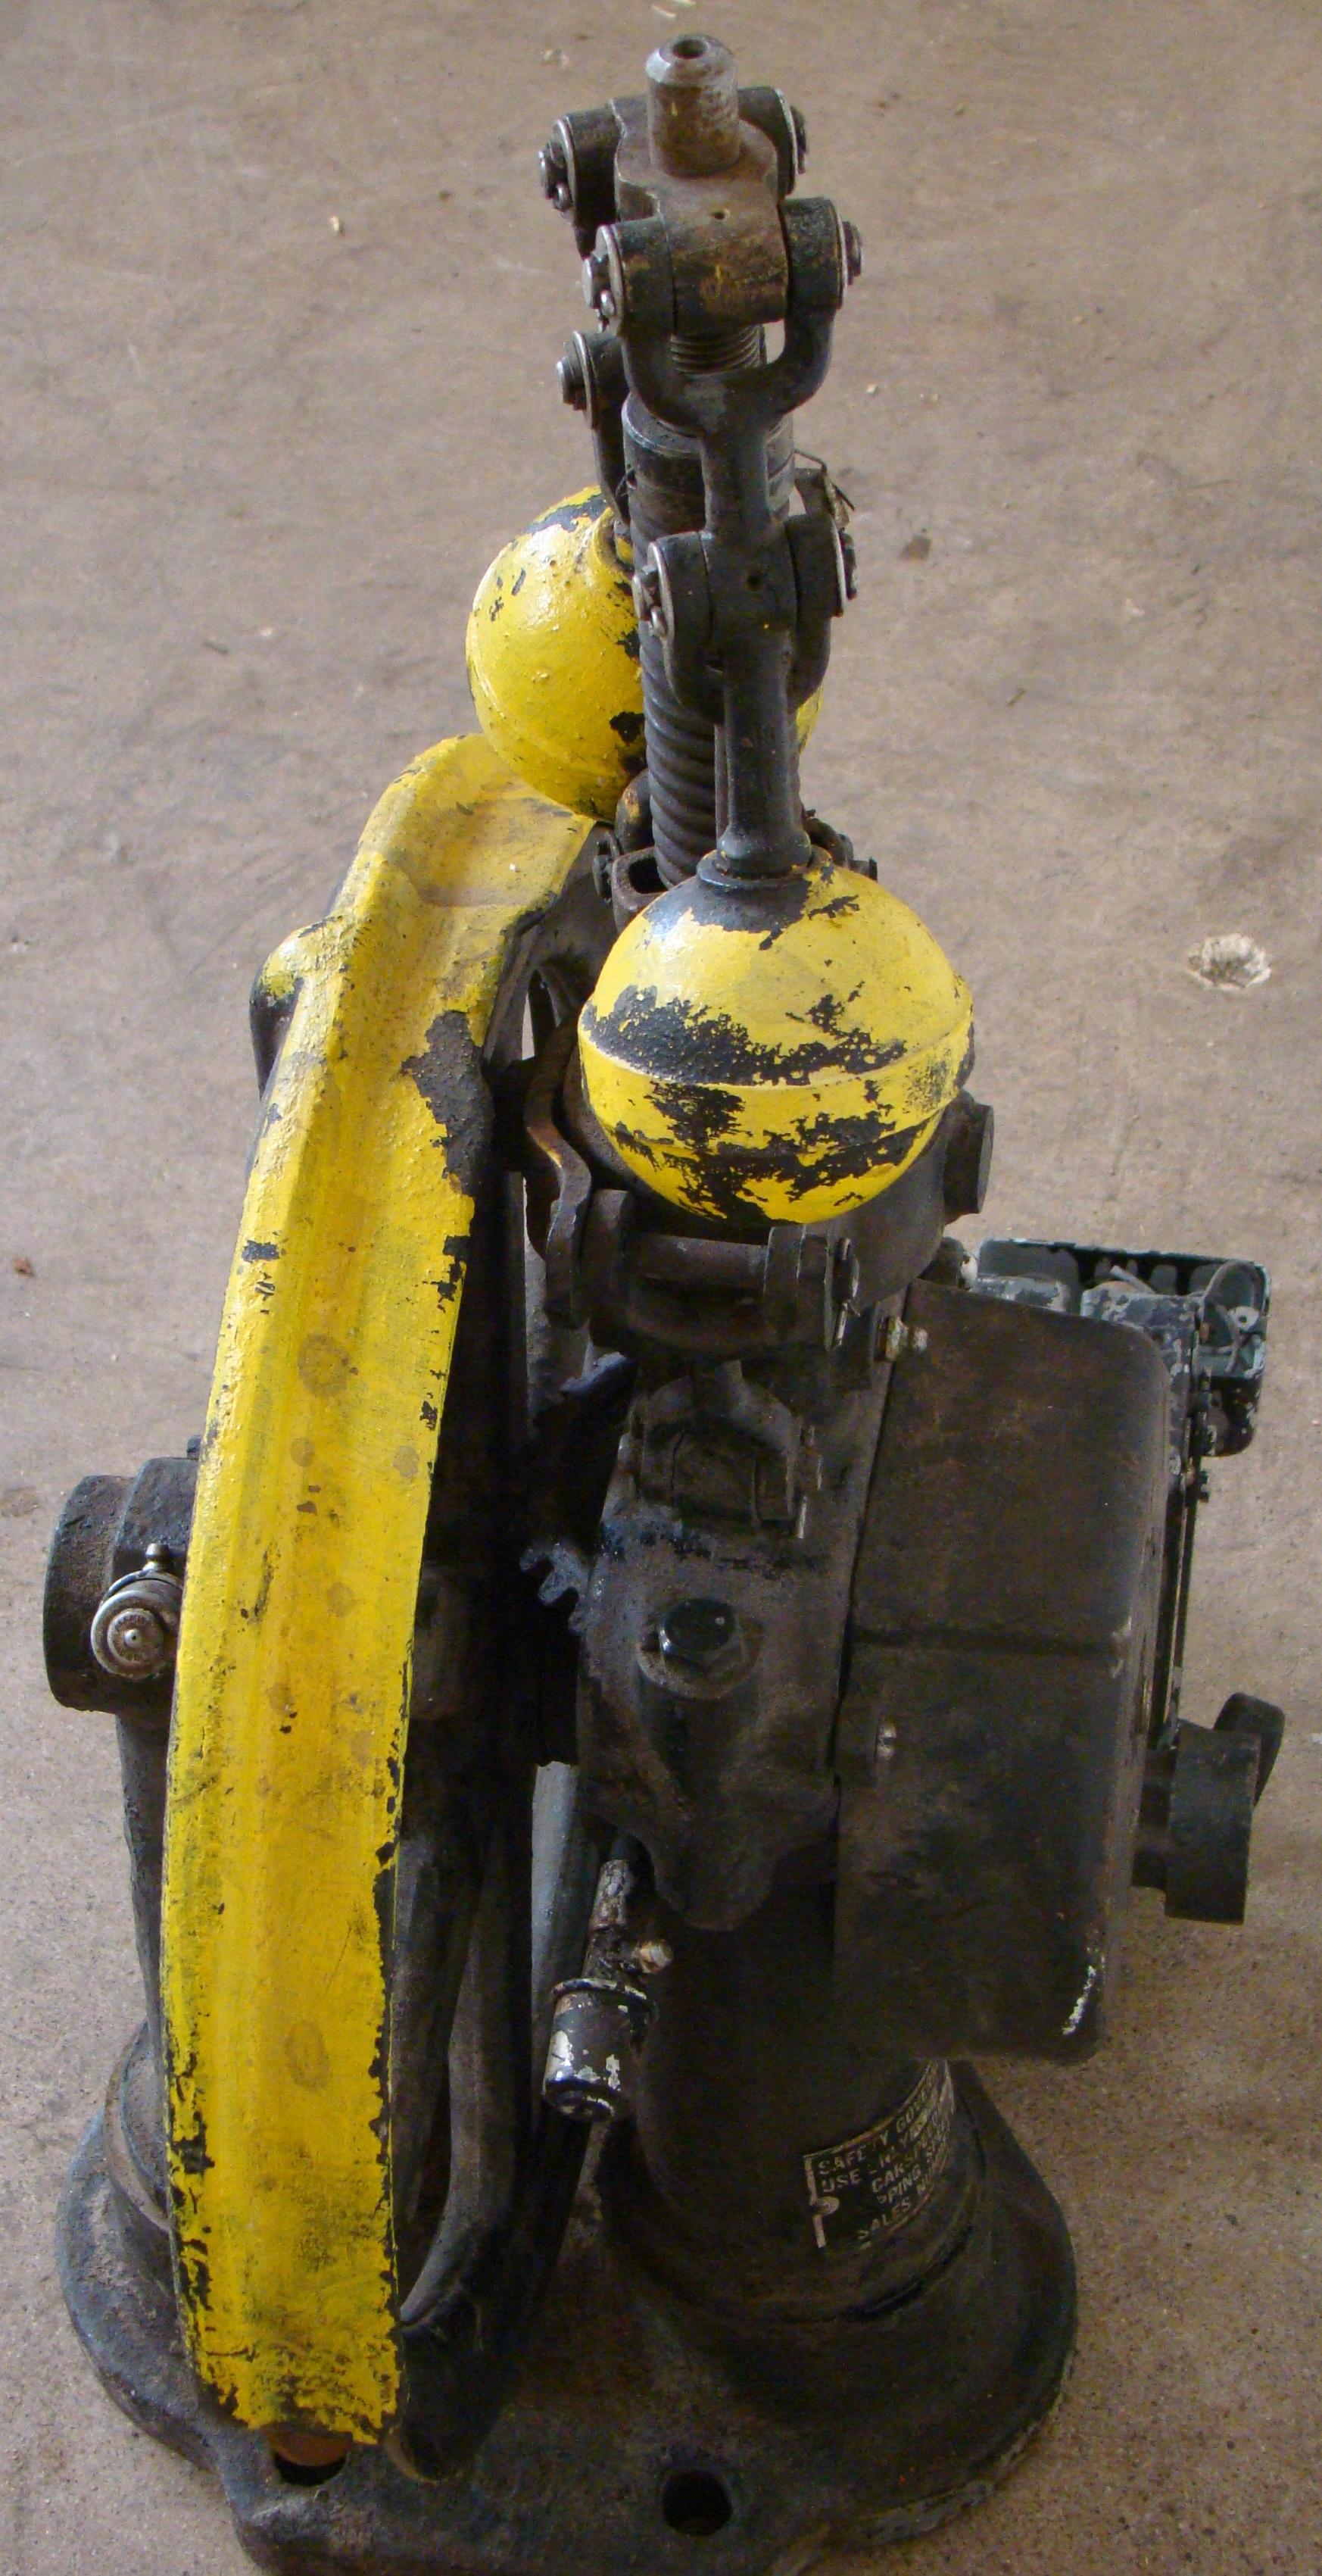 Antique Otis Elevator Safety Governor Brake, Cast Iron Brass Steampunk Carspeed, 700 FPM - Image 5 of 5